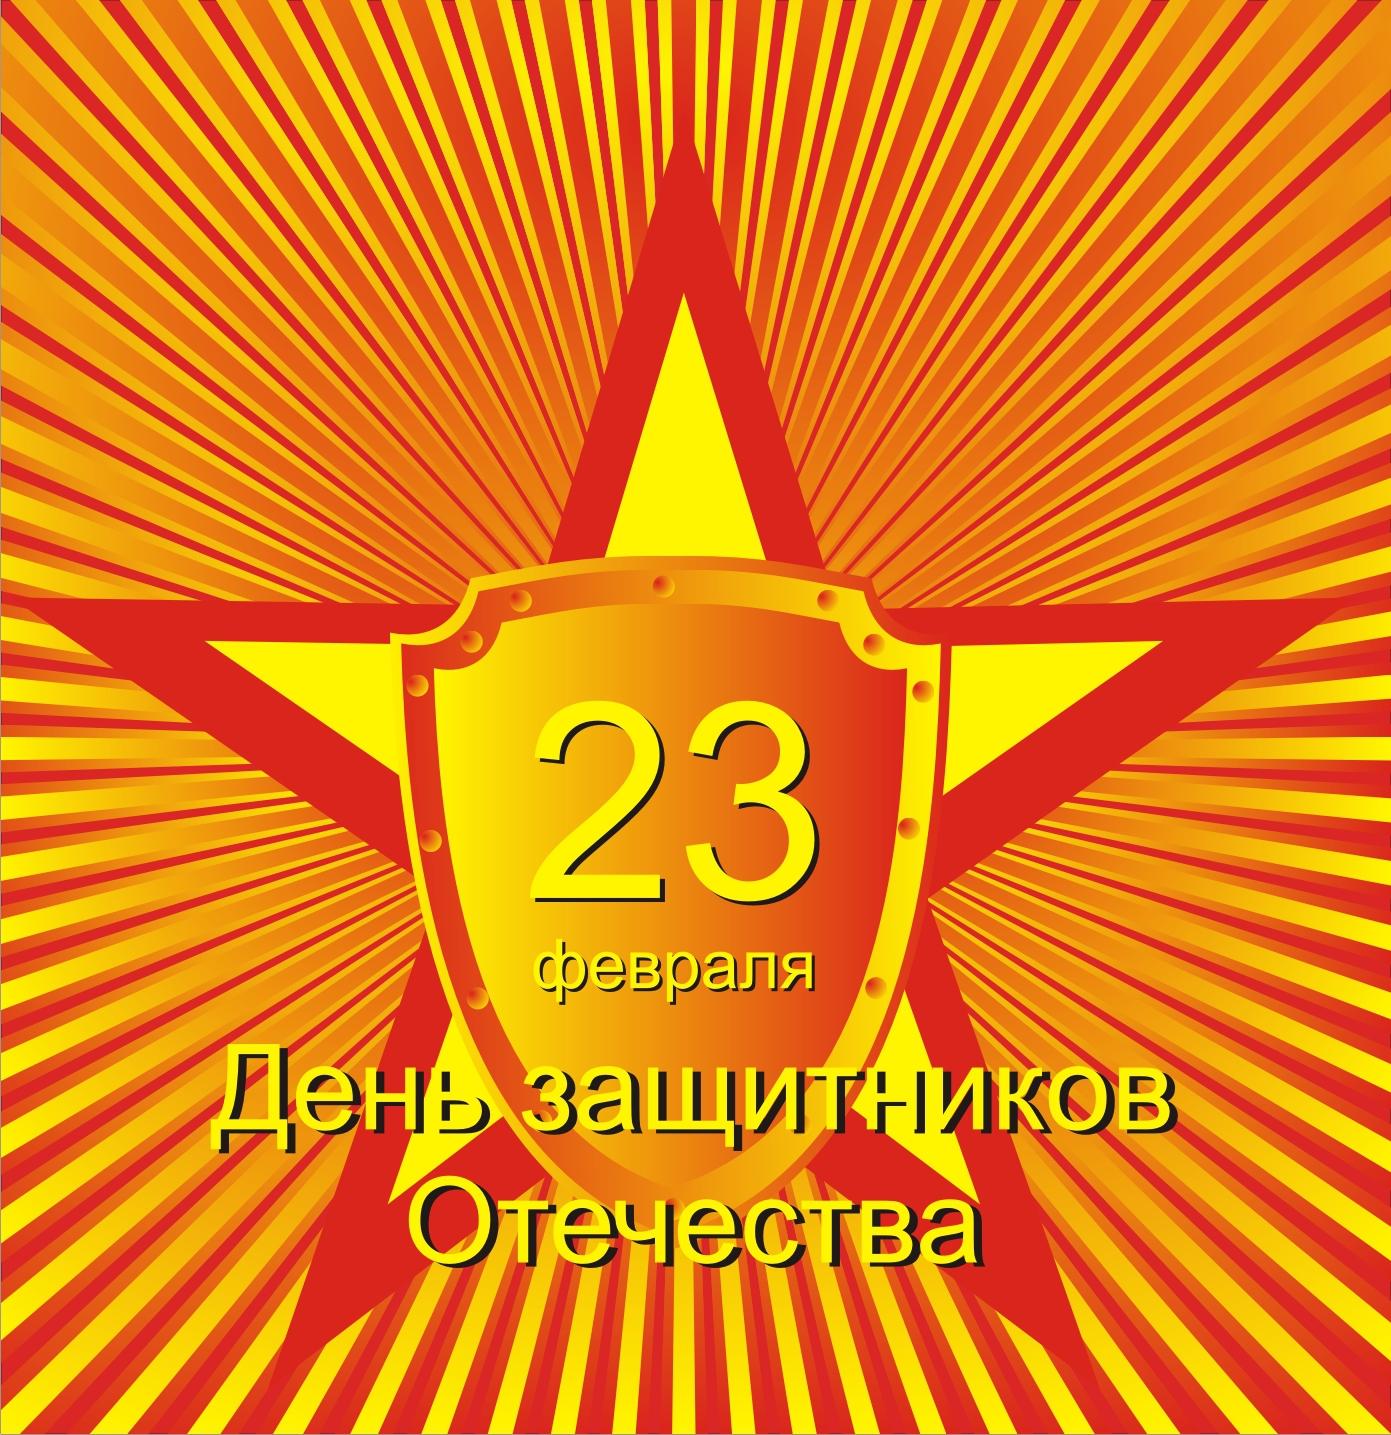 Акция открытка для защитника отечества